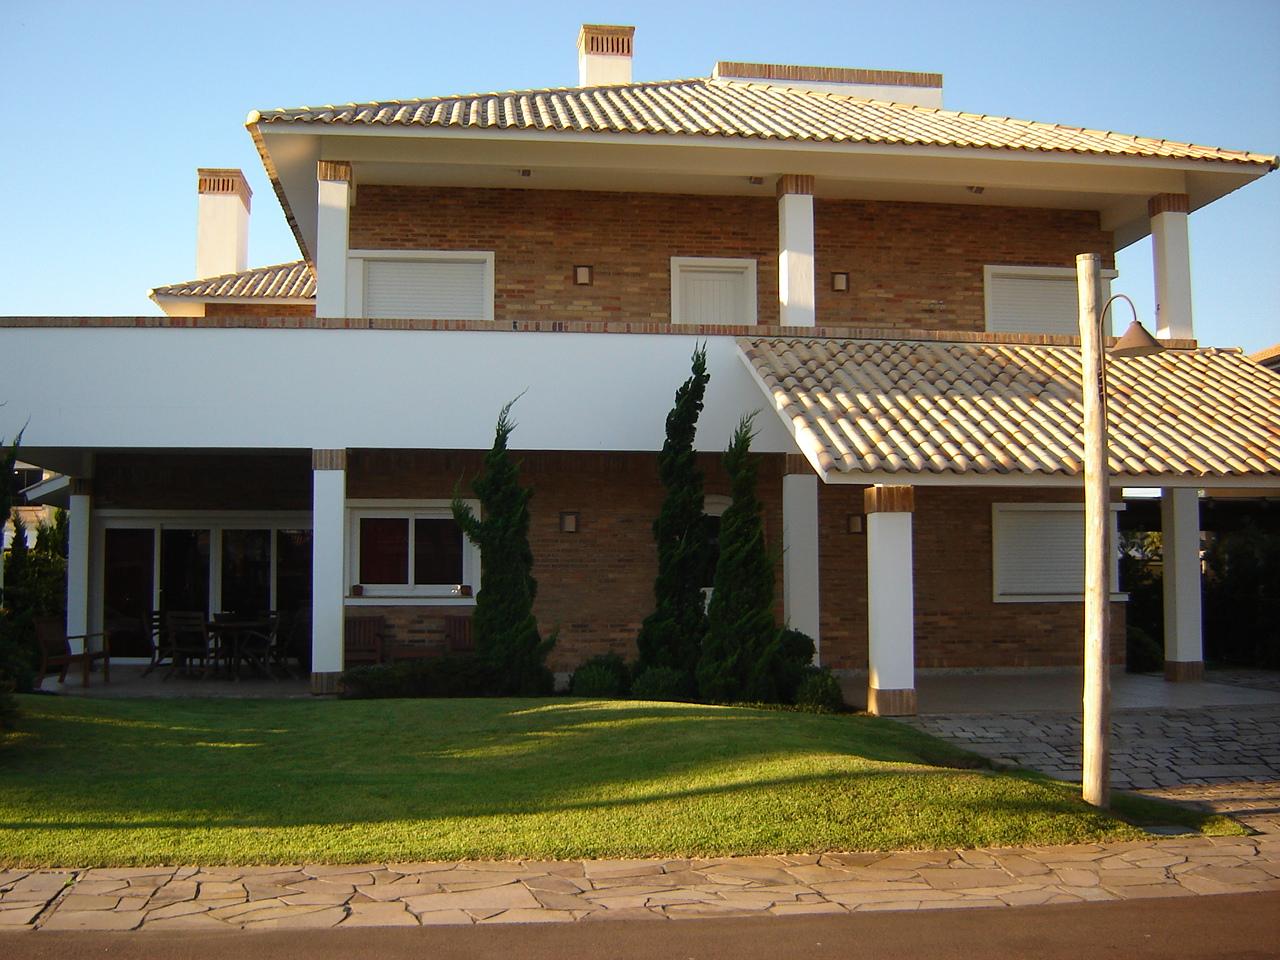 Casa las dunas 01 hinnah dulinski engenharia arquitetura design - Casa las dunas ...